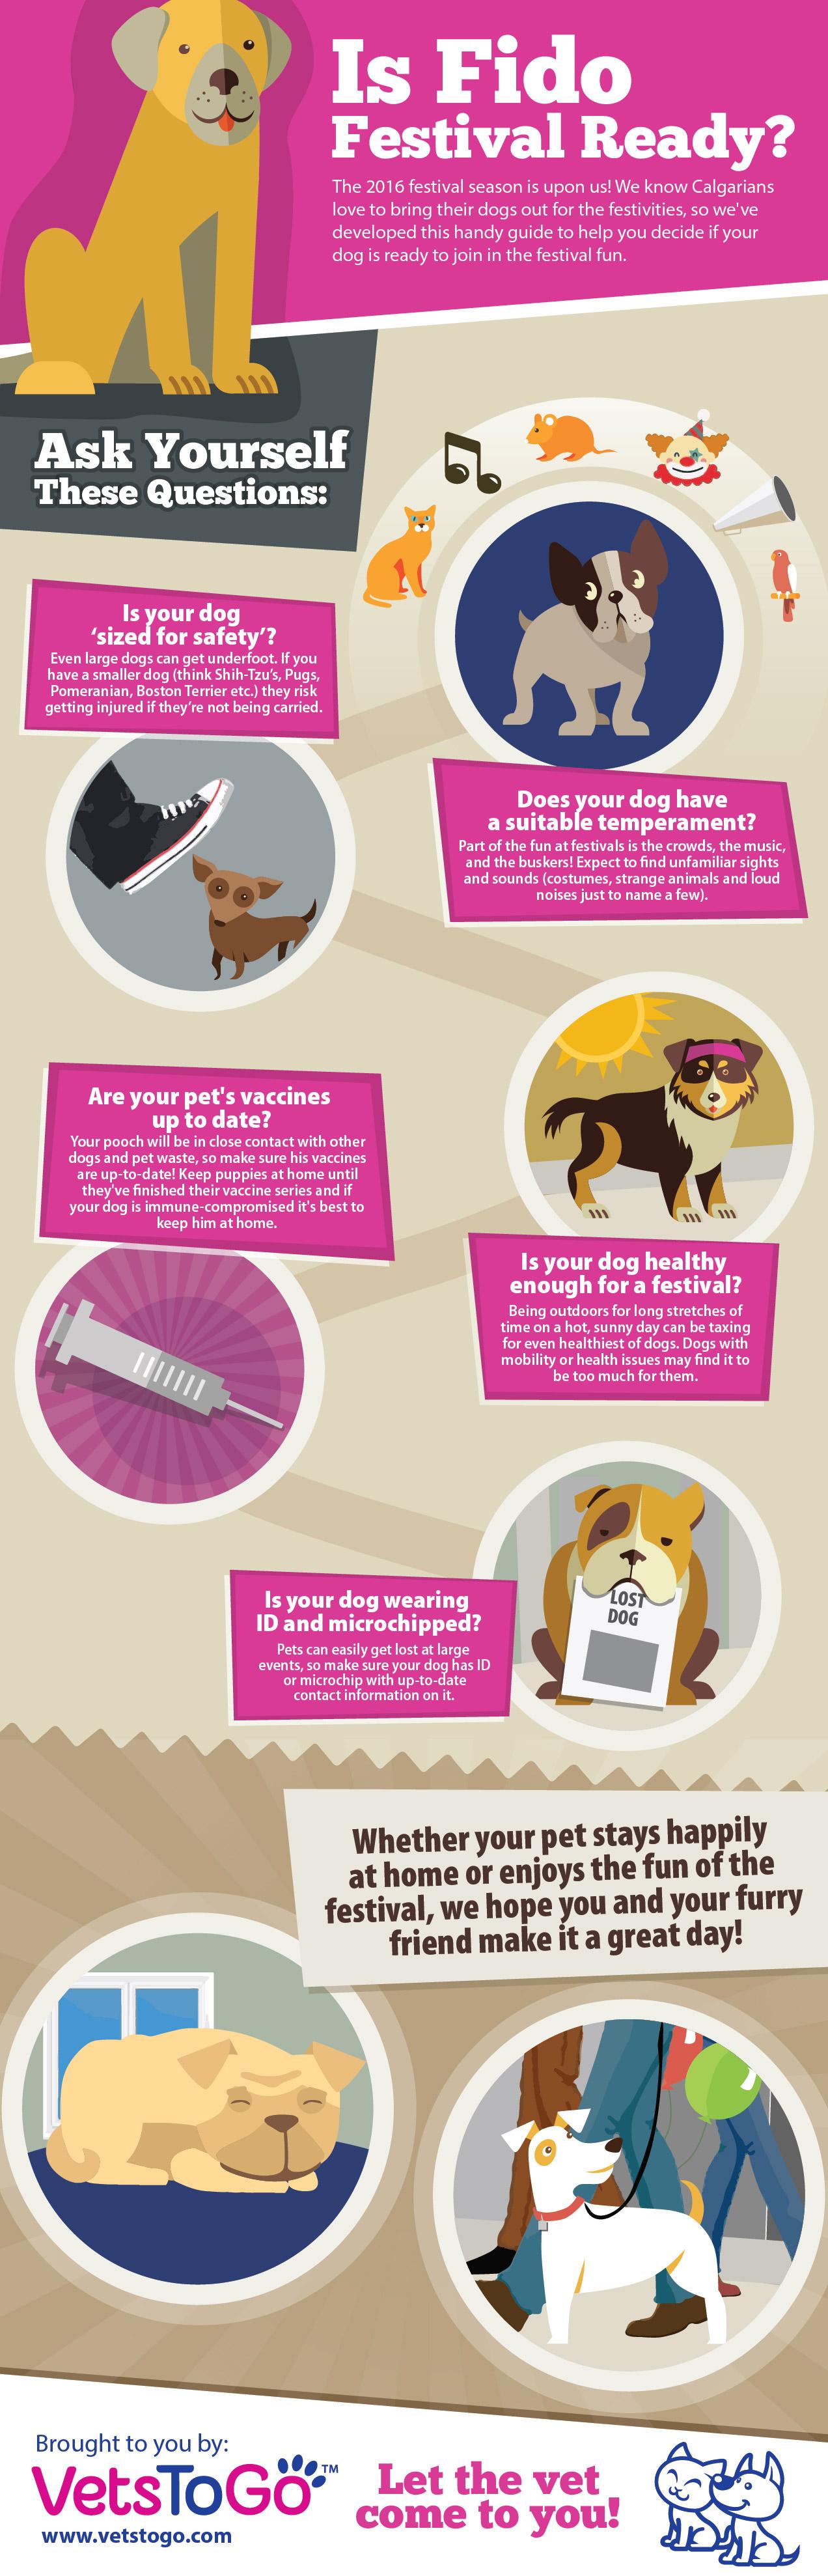 pet safety at festivals Dogs, Pets, Dog wear